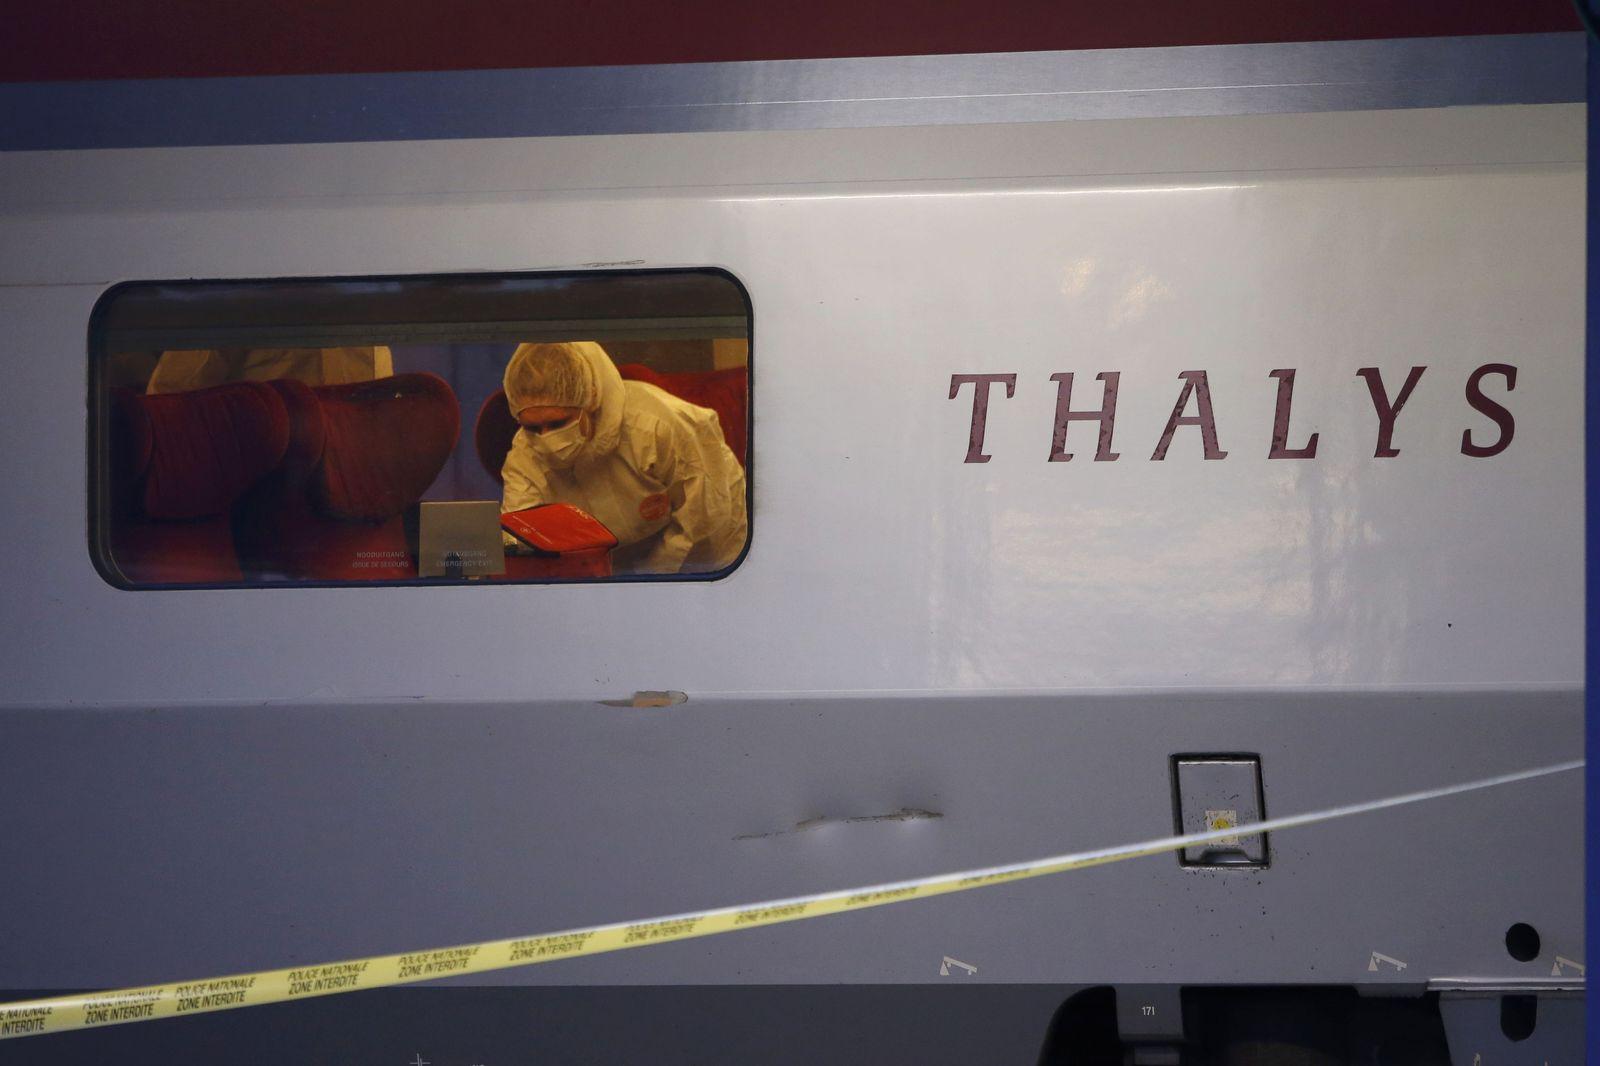 Thalys/ arras